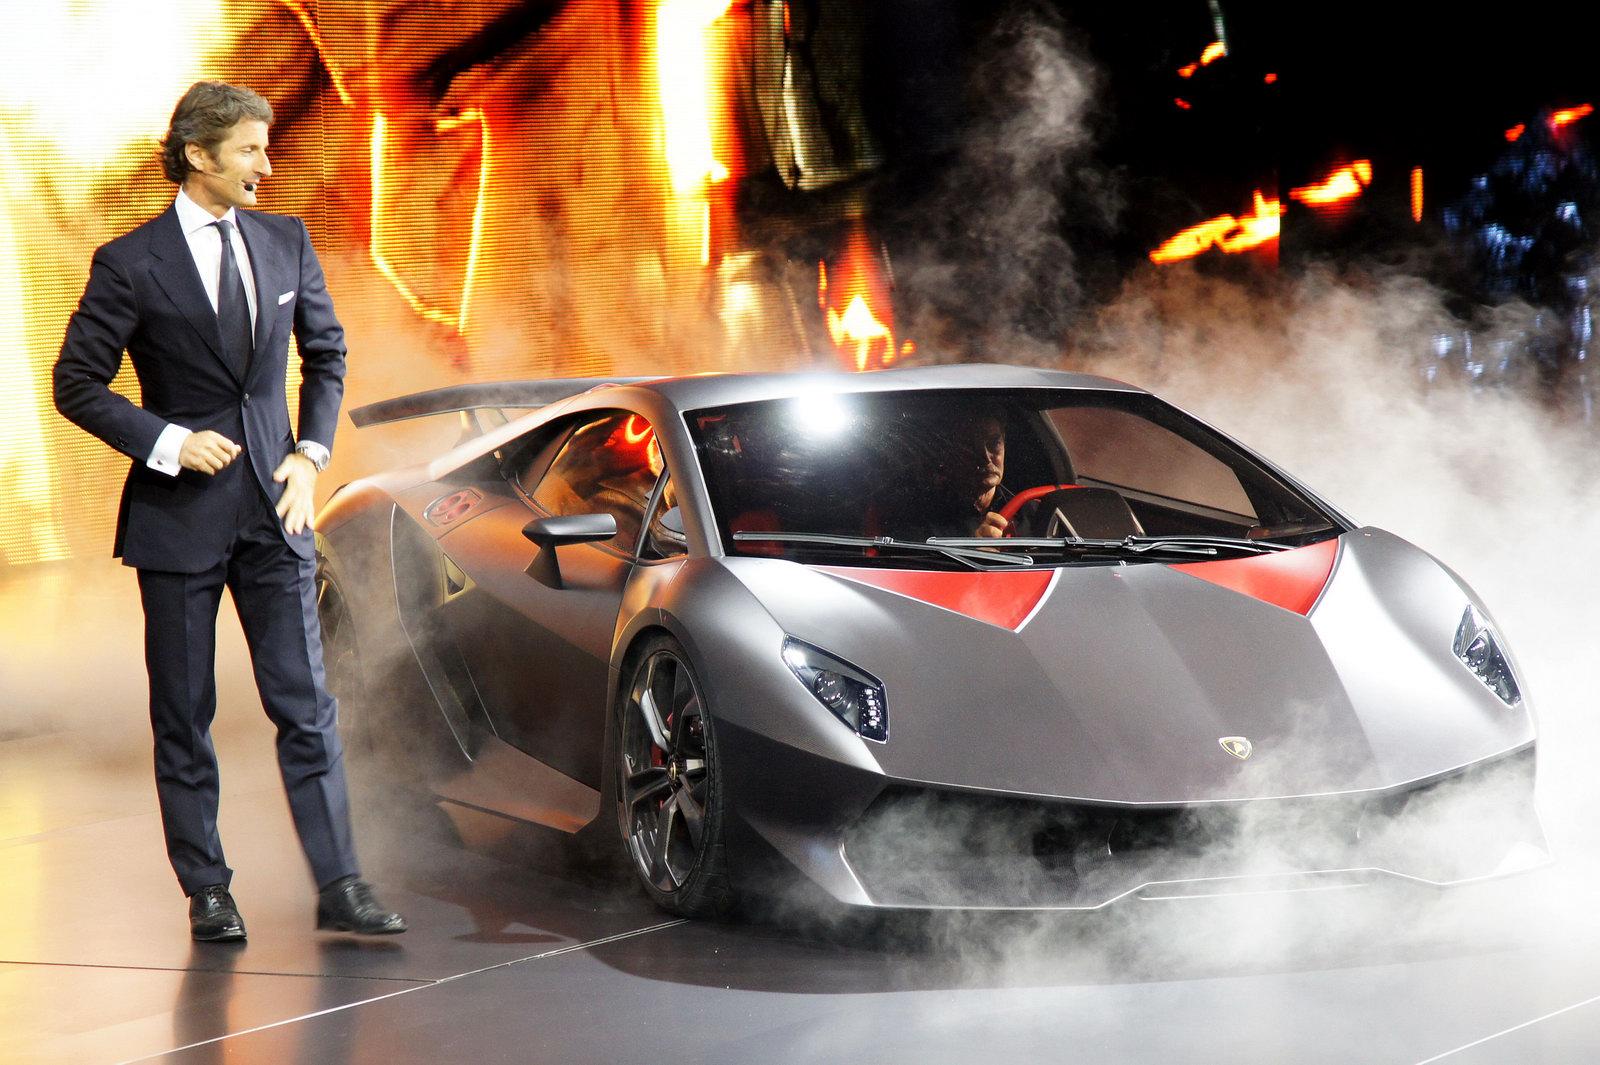 http://1.bp.blogspot.com/-k0JGCZDxjPg/UNUsVmx-81I/AAAAAAAAJ00/lDx8mpt1tBc/s1600/Lamborghini-Sesto-Elemento.jpg